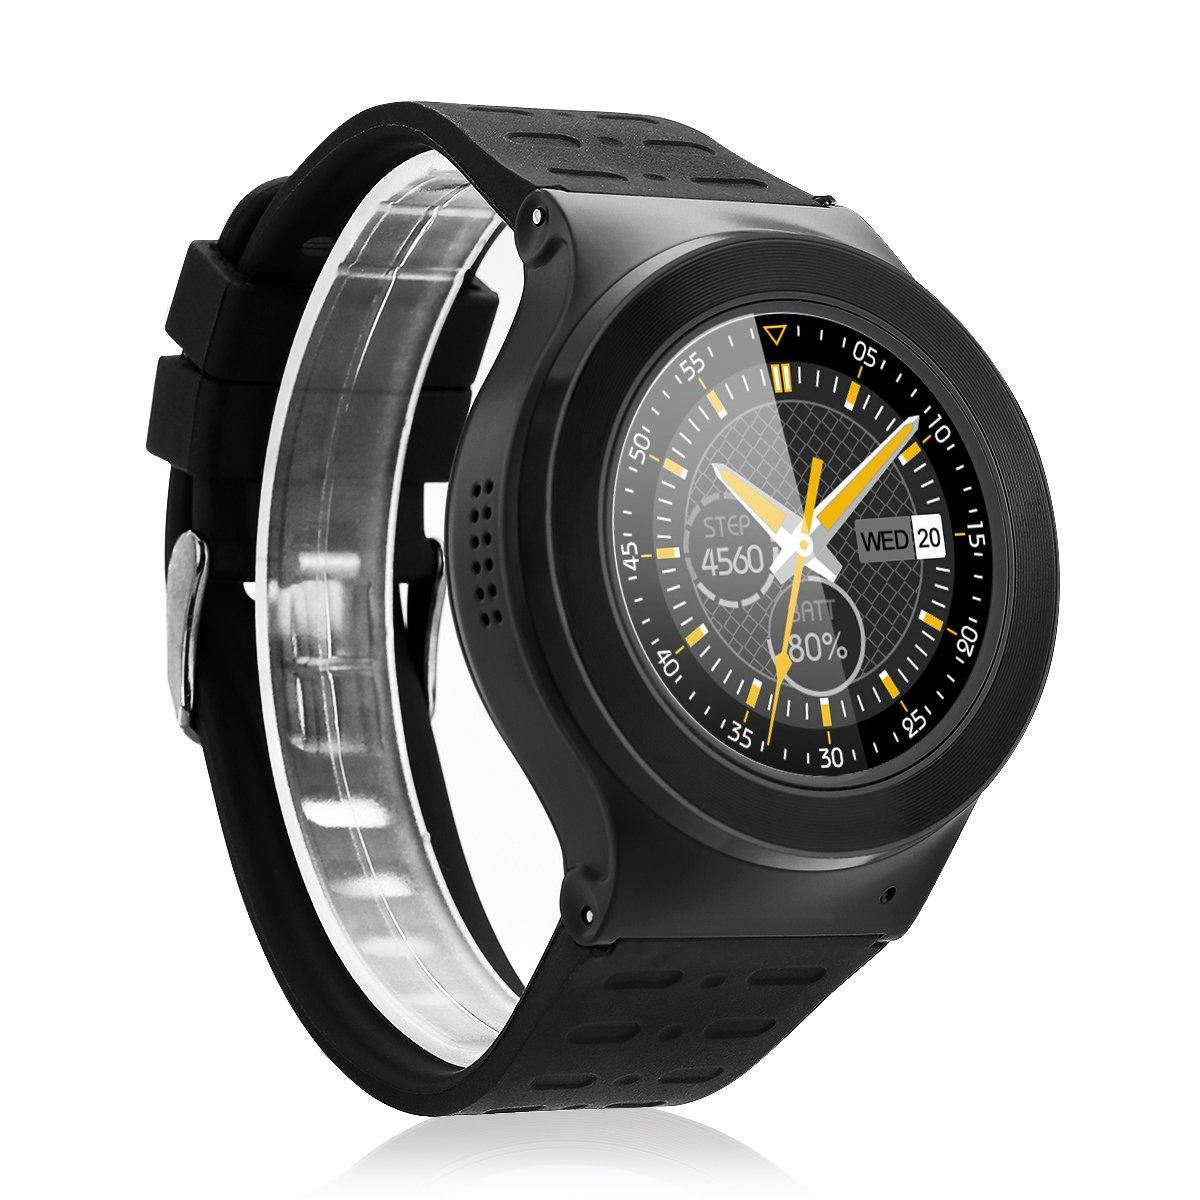 Diggro S99 - Smartwatch Pulsera Inteligente para Móvil Android (MTK6580, Android 5.1, Soporte Tarjeta SIM de Teléfono, 3G, Wifi, Bluetooth, Fitness ...